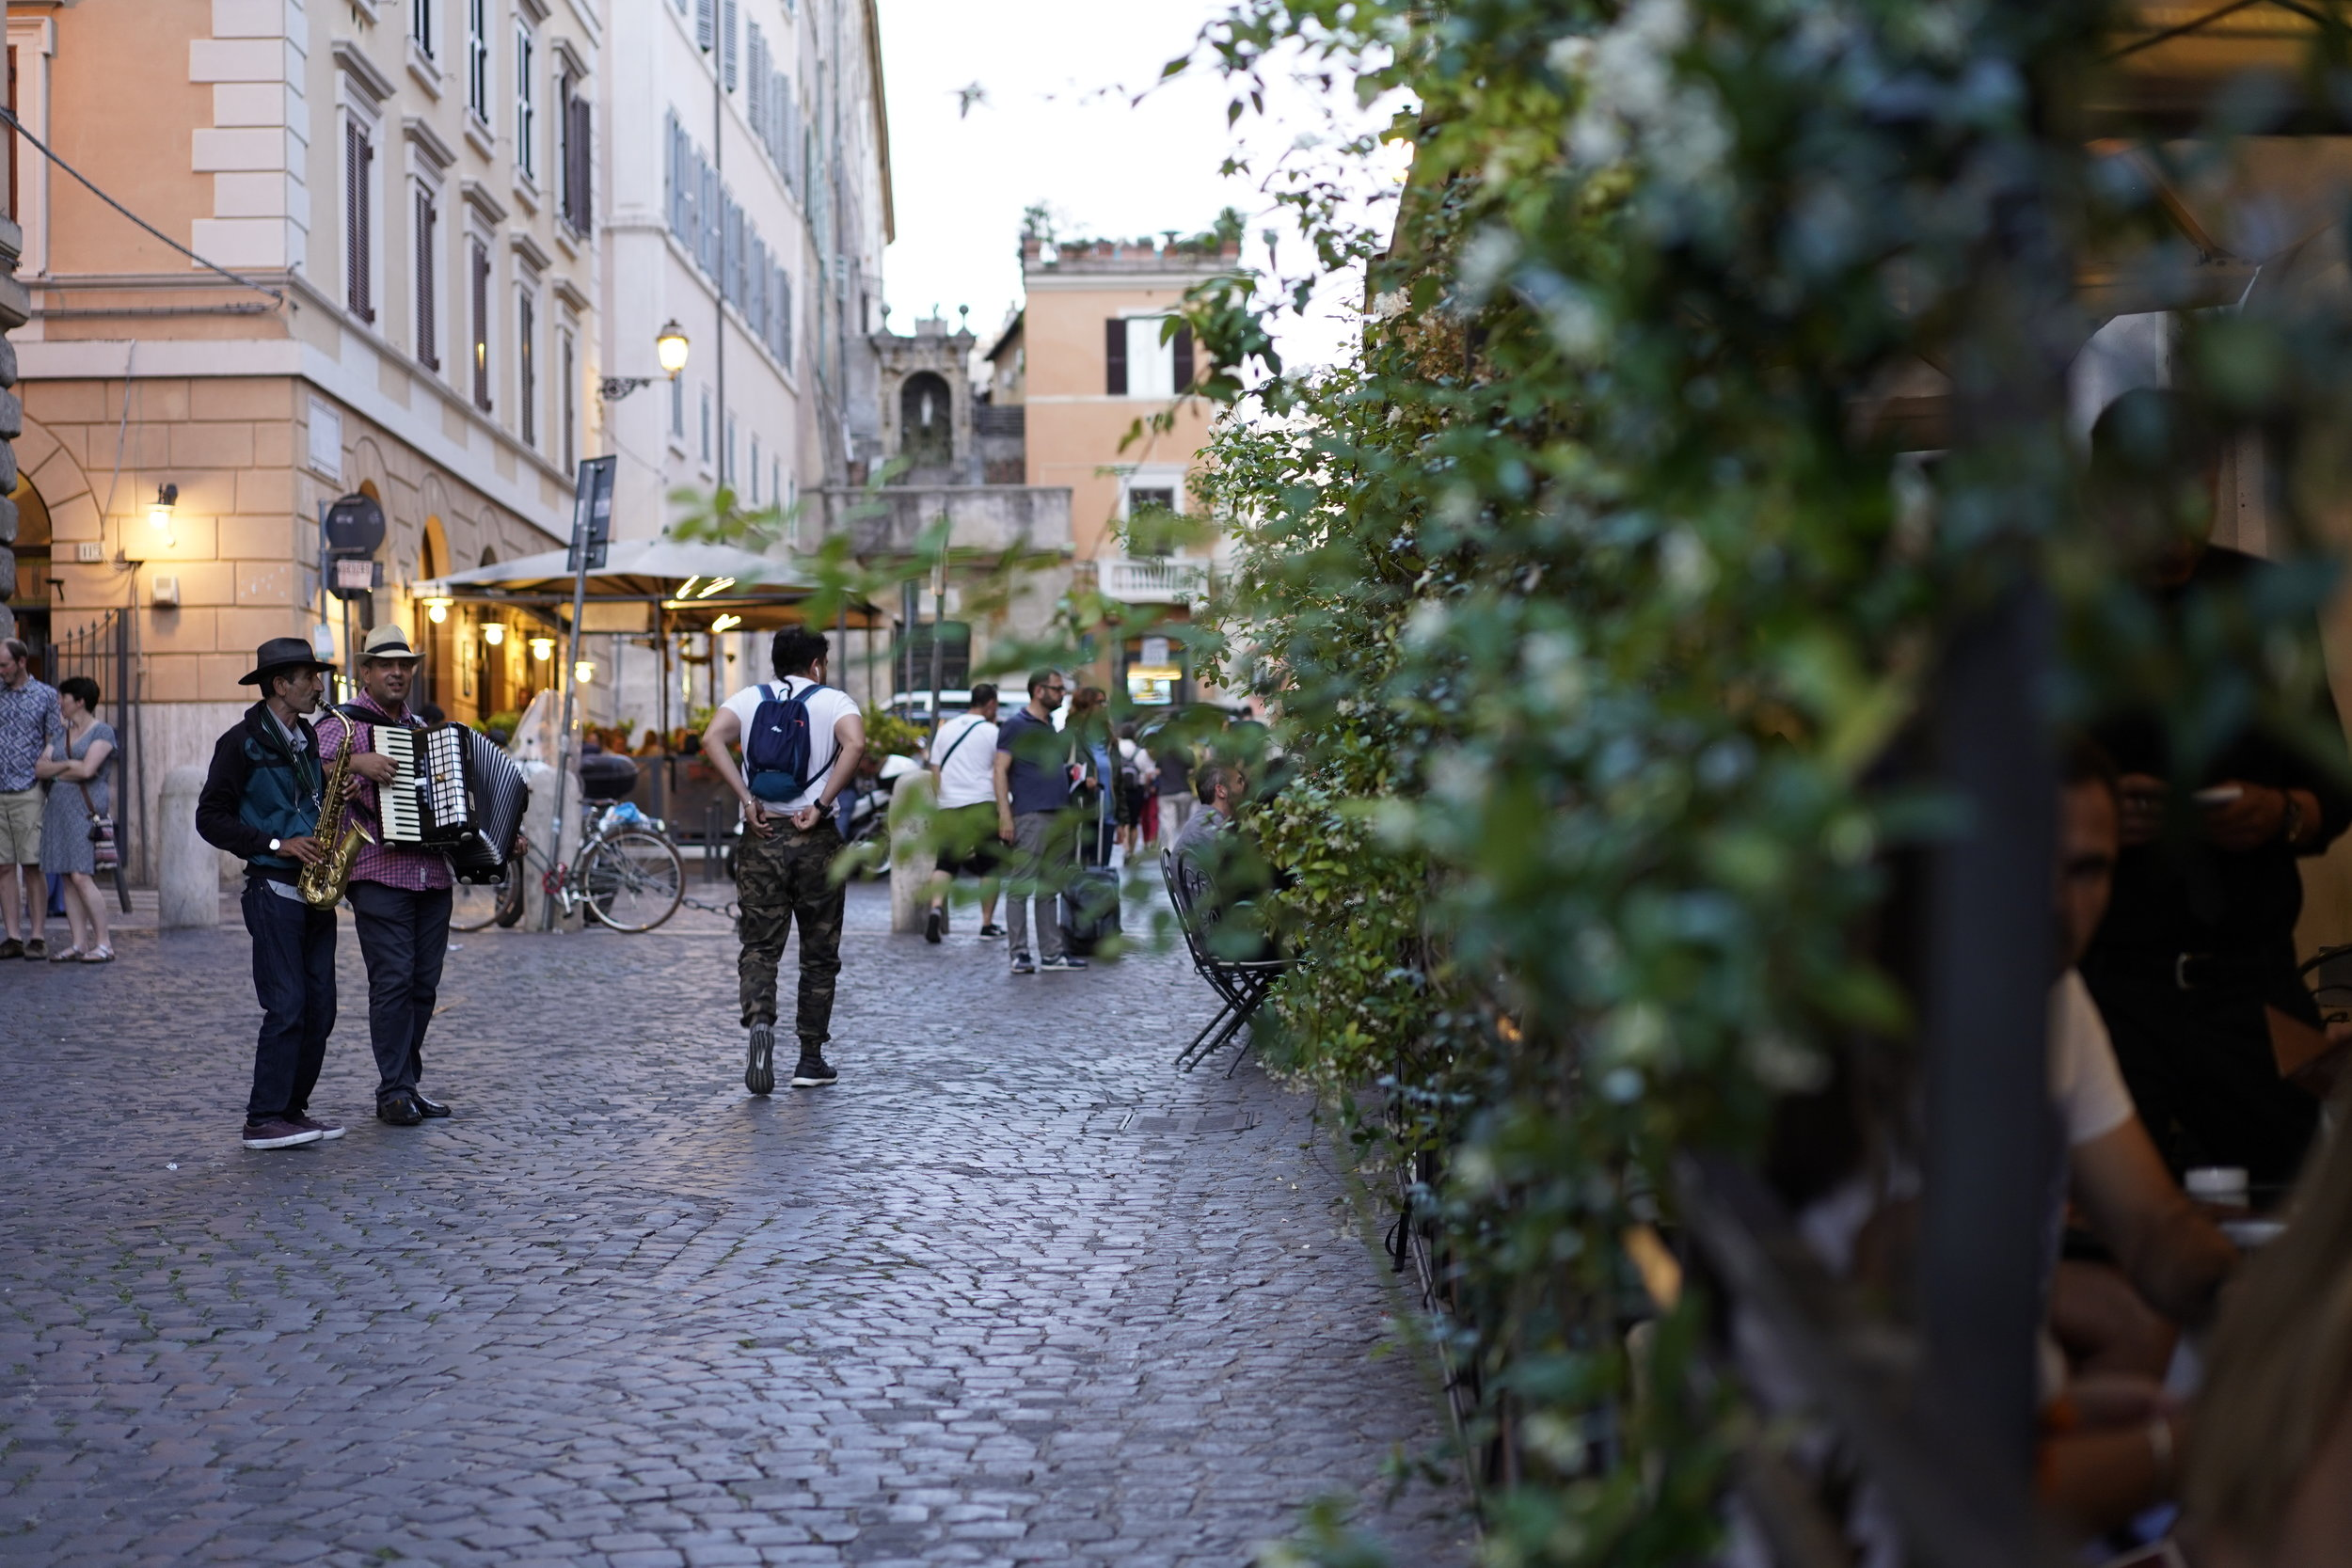 Italy2018_005.jpg